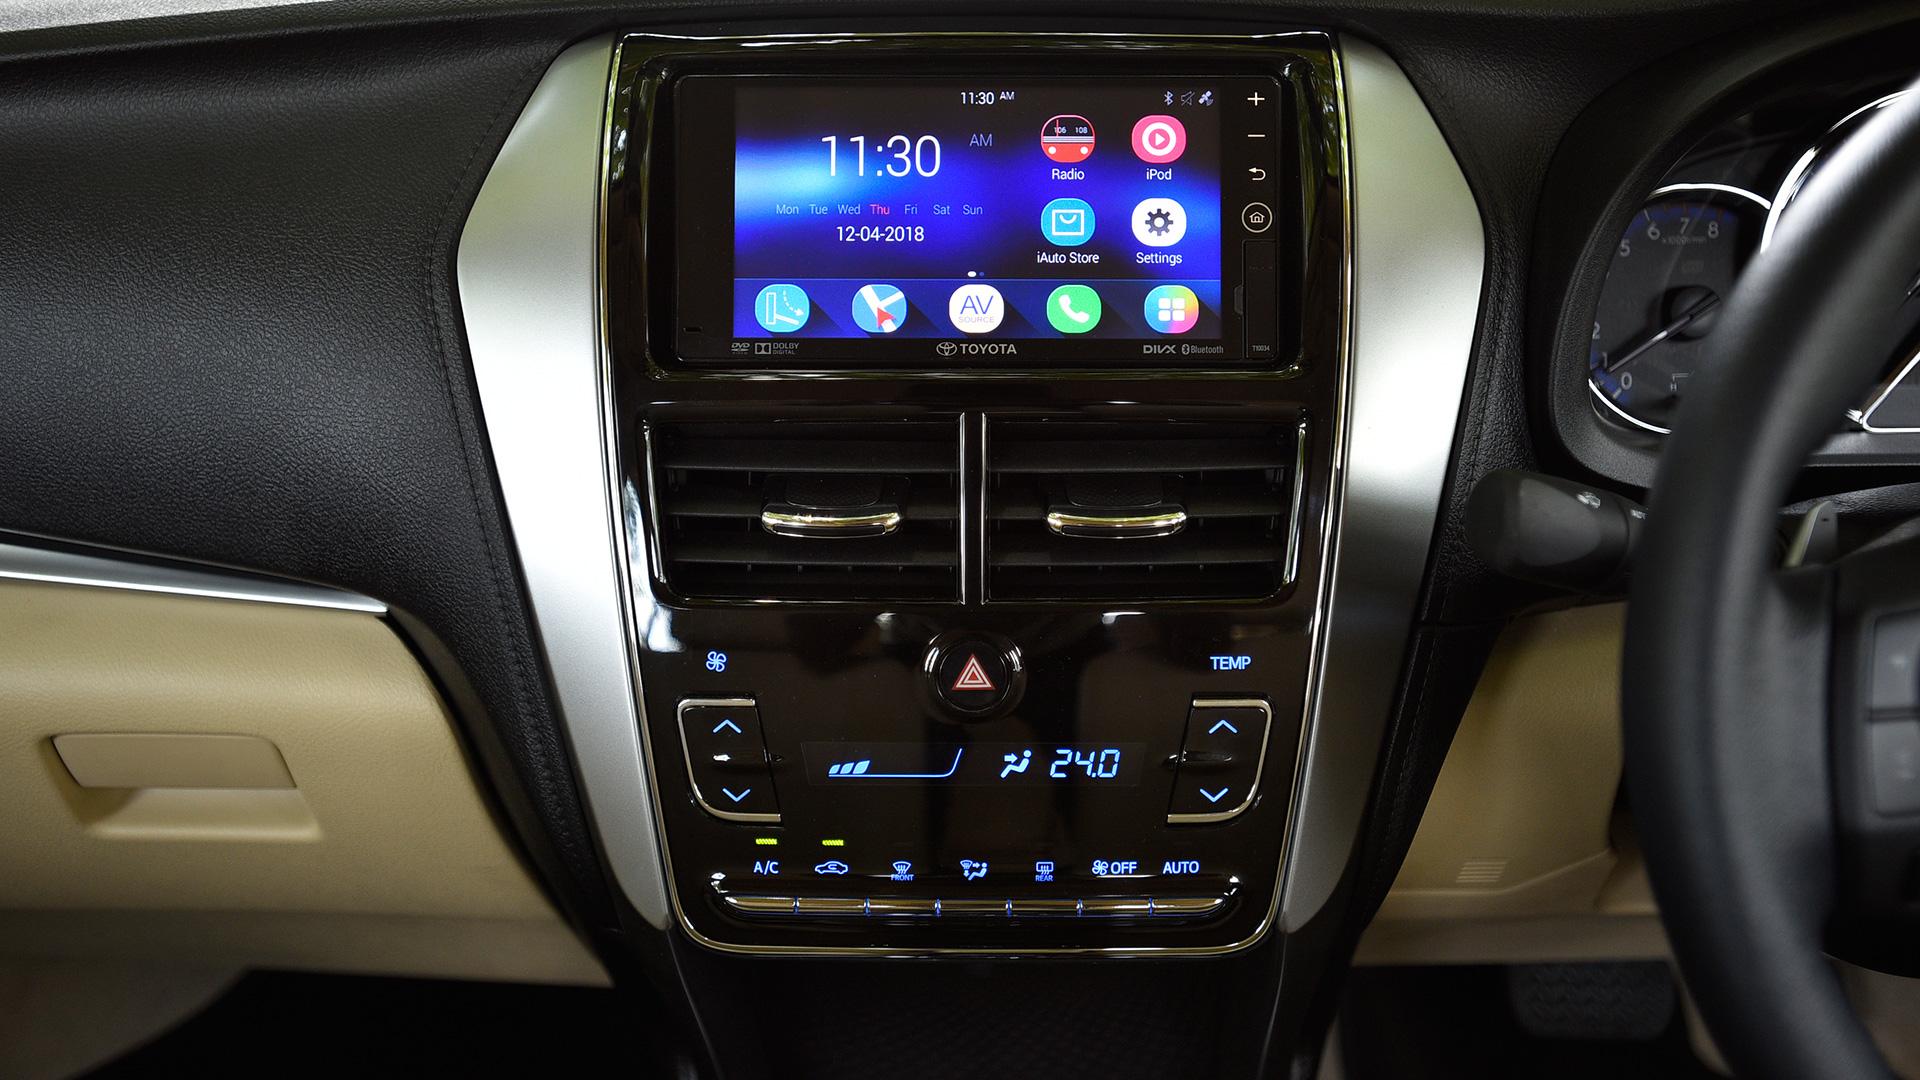 Toyota Yaris 2018 VX CVT Interior